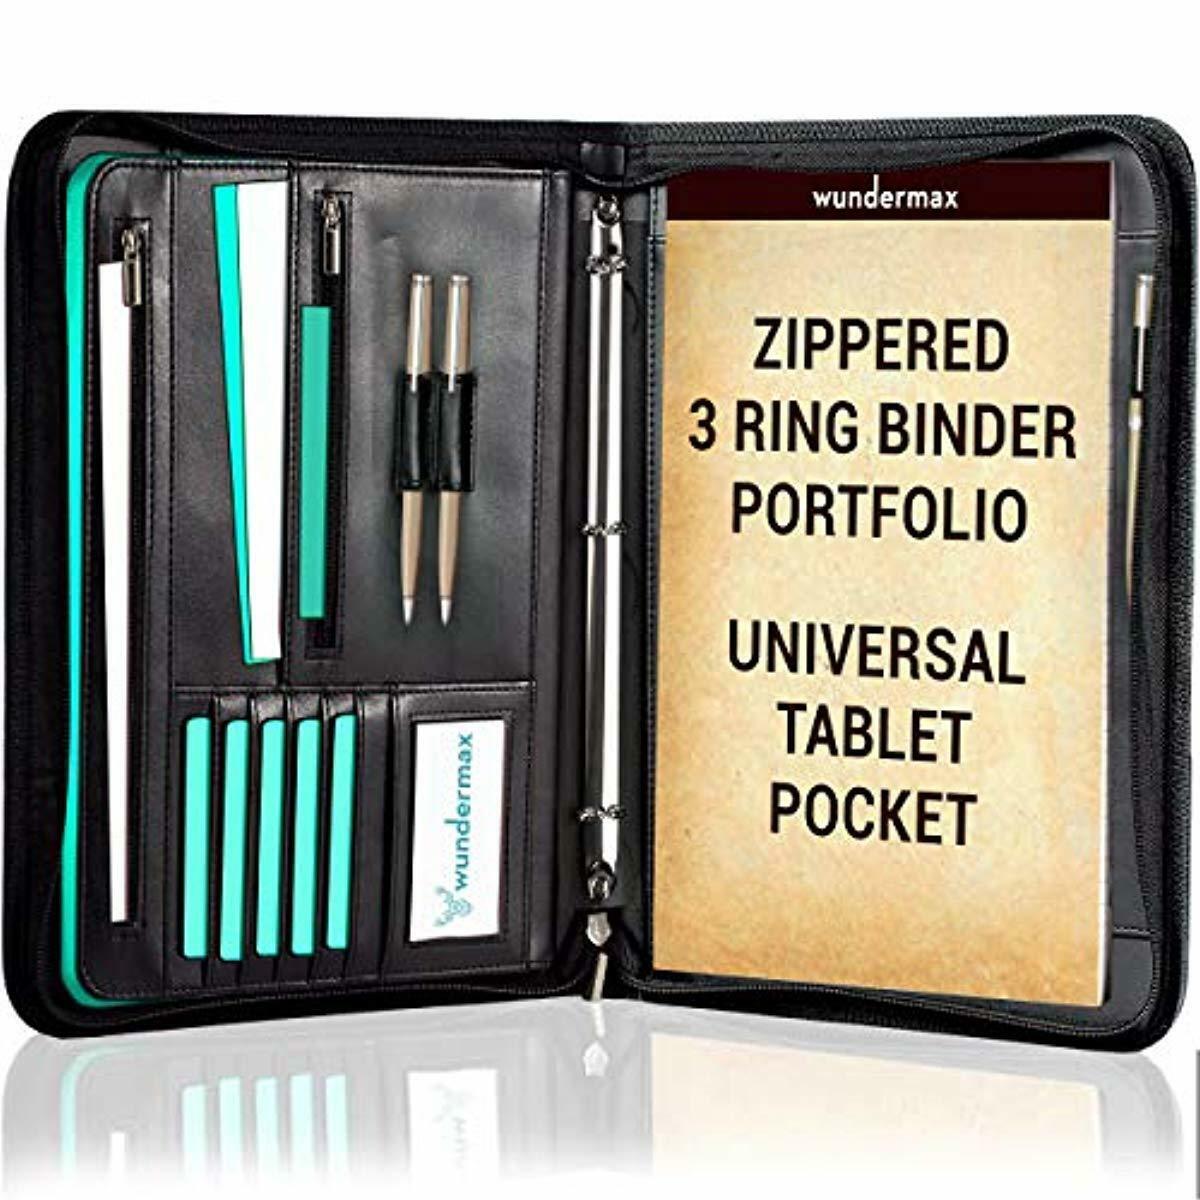 Portfolio Binder A Zippered Padfolio with 3 Ring Binder Docu